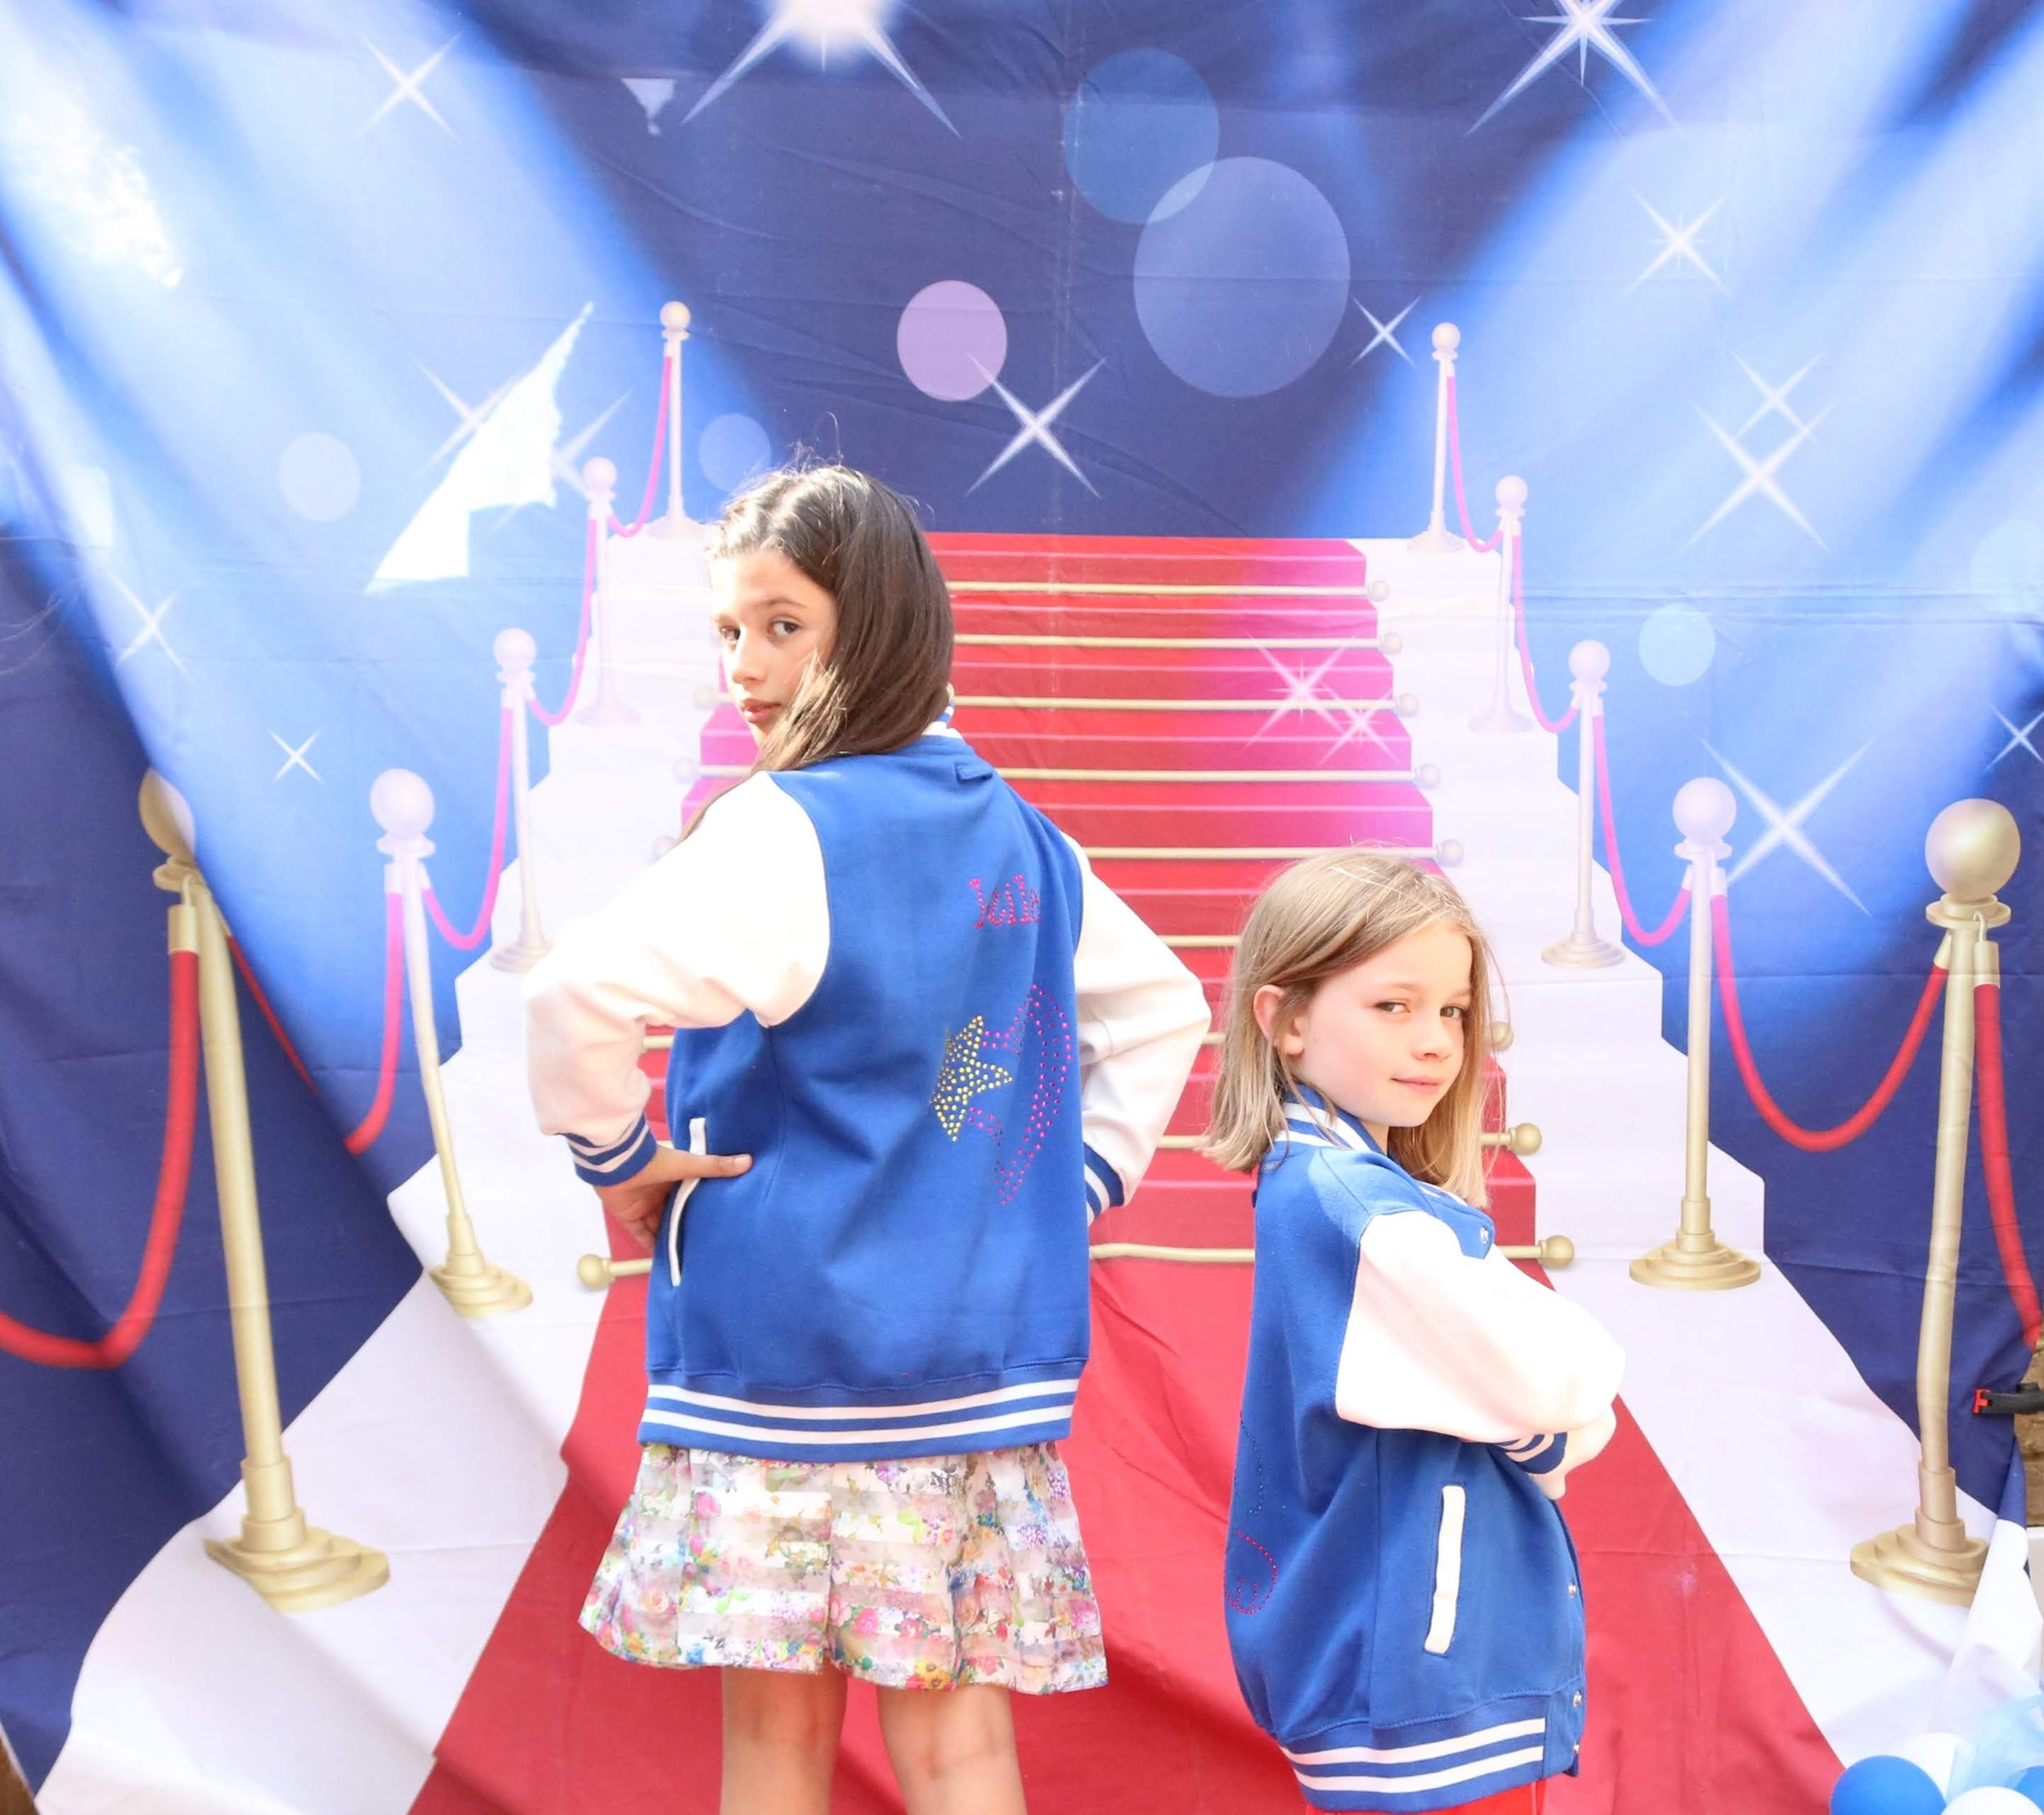 children's fashion party picture